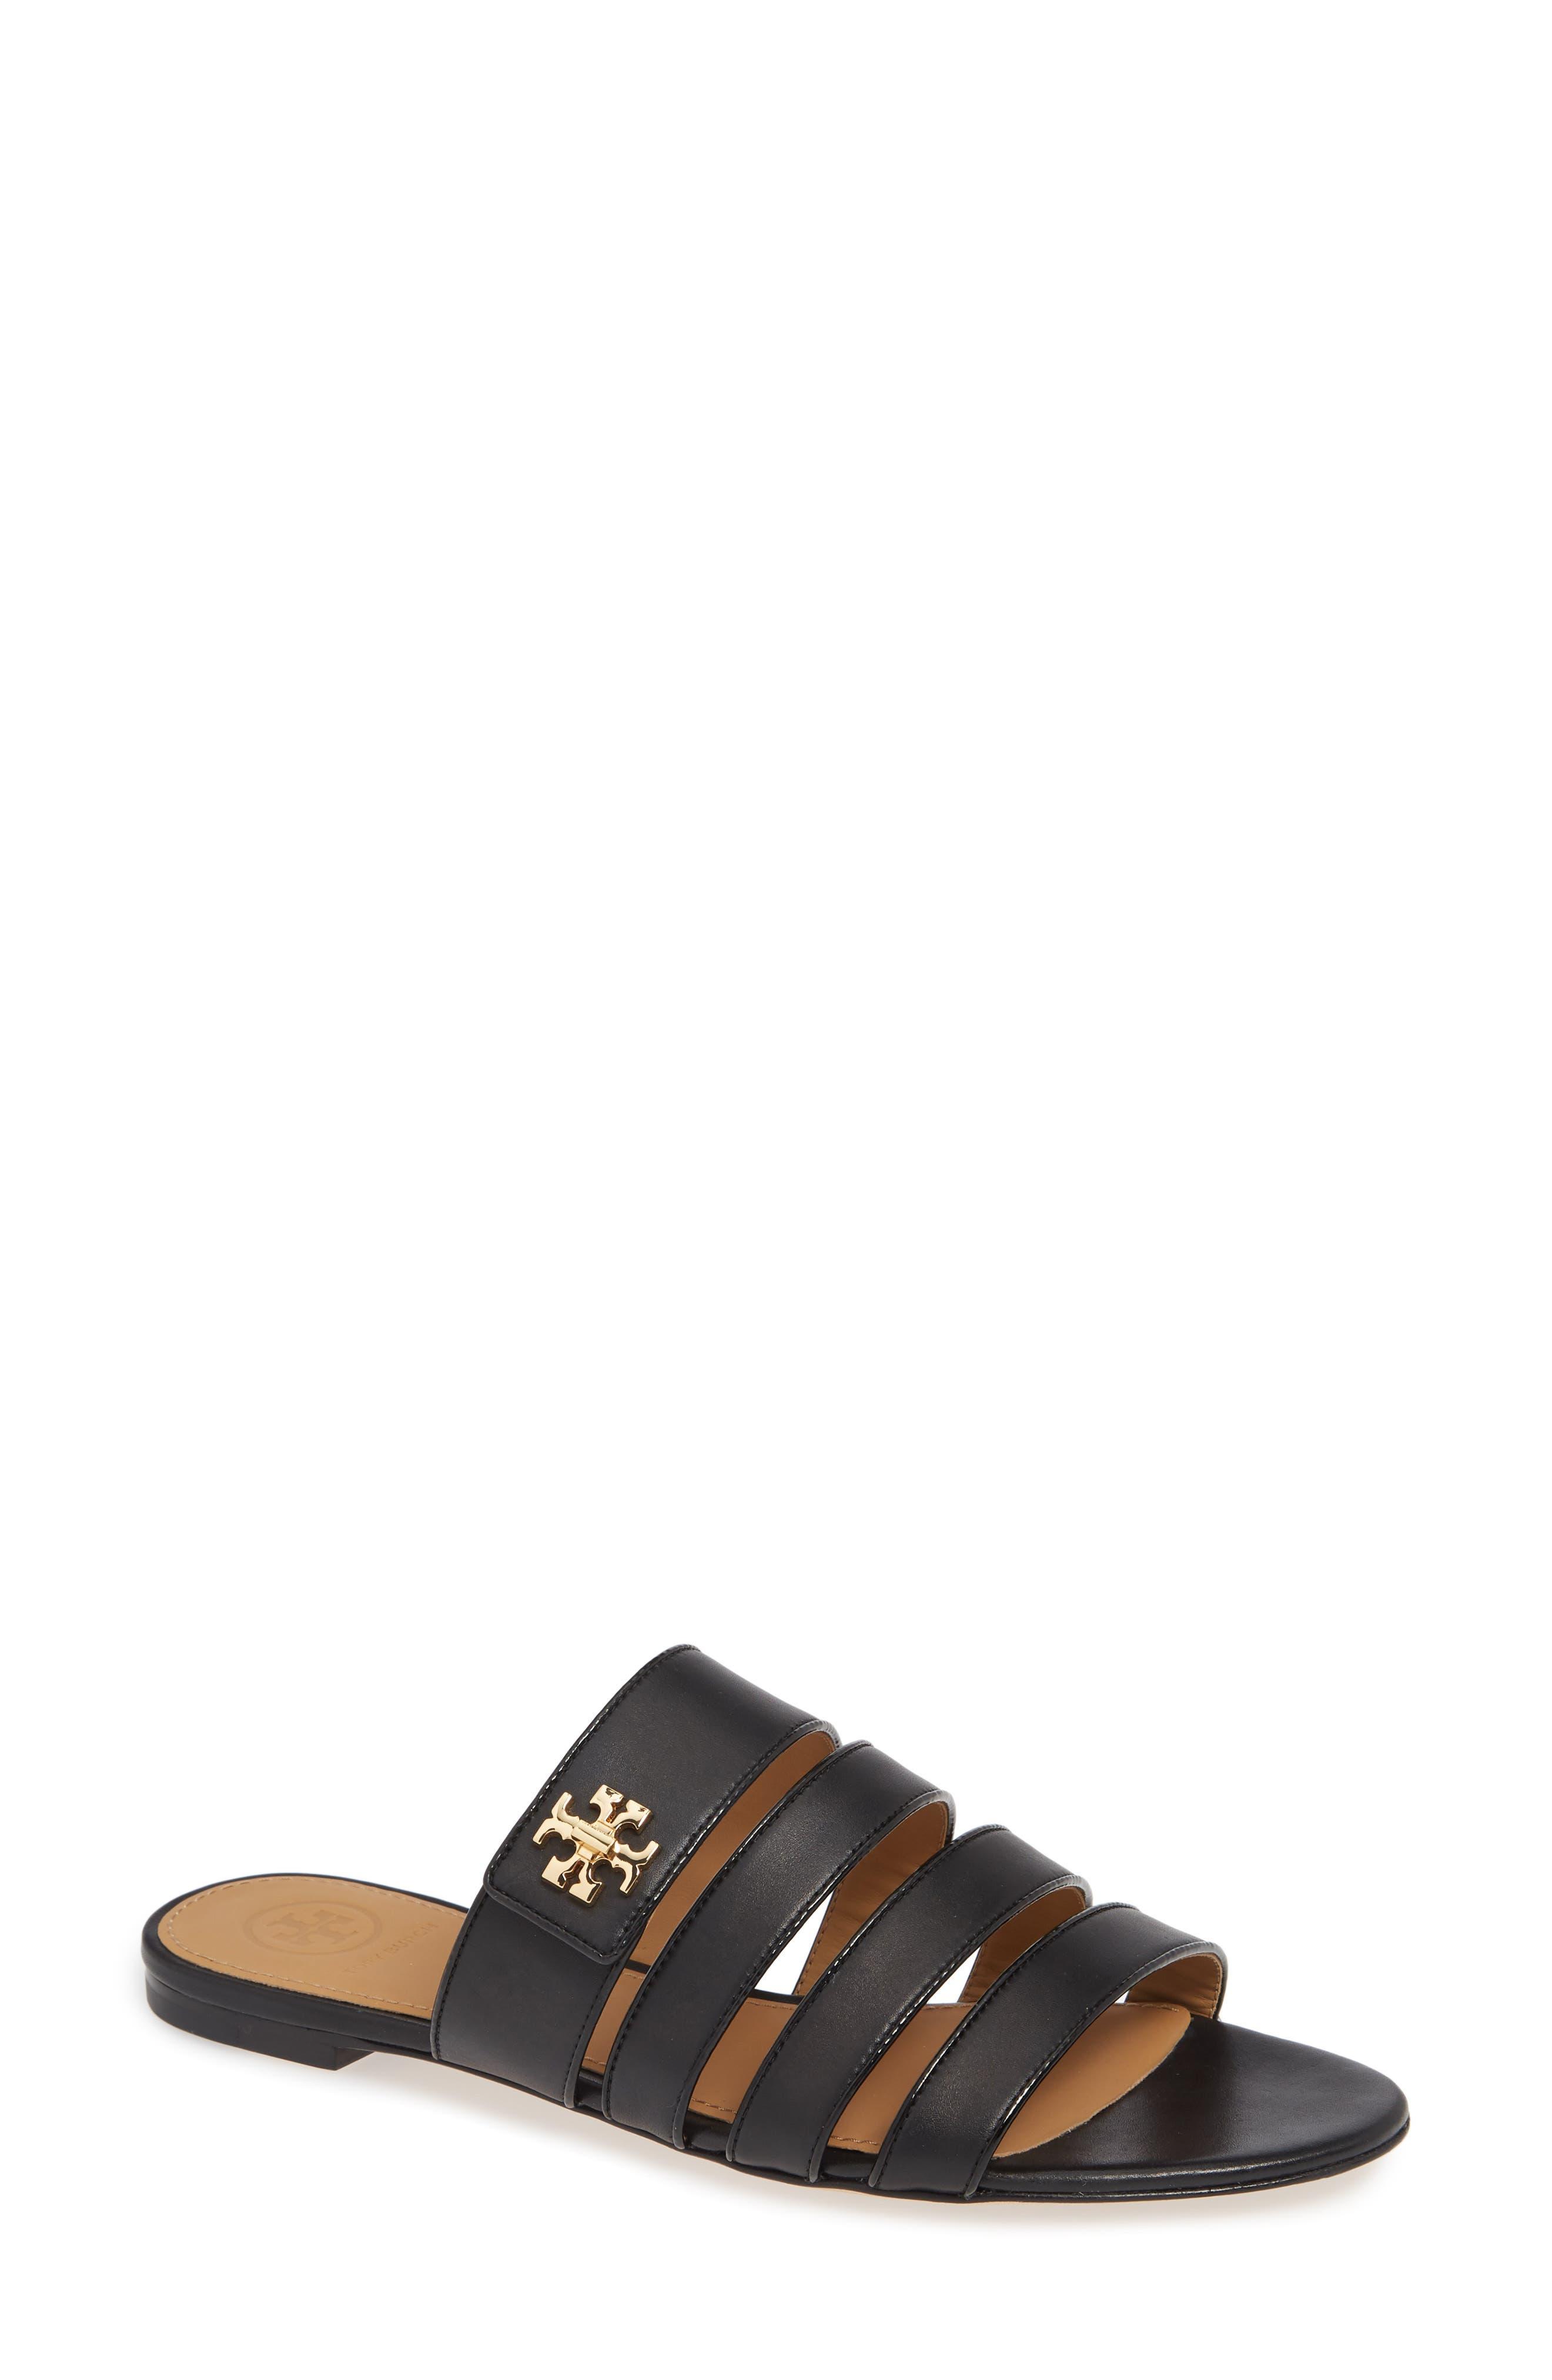 Tory Burch Kira Strappy Slide Sandal, Black